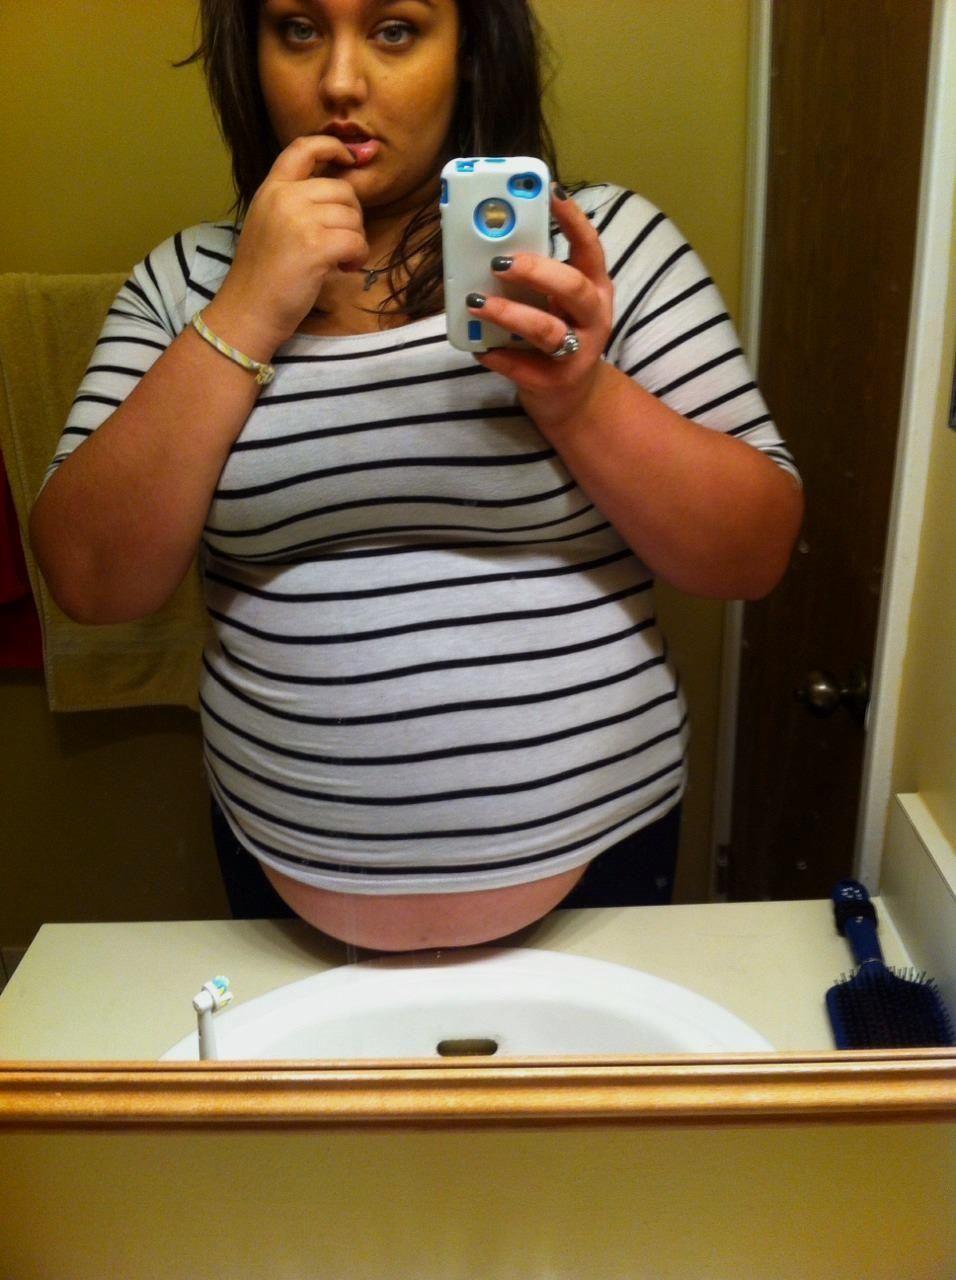 Fat Women Pregnancy Fun Stuff Fun Things